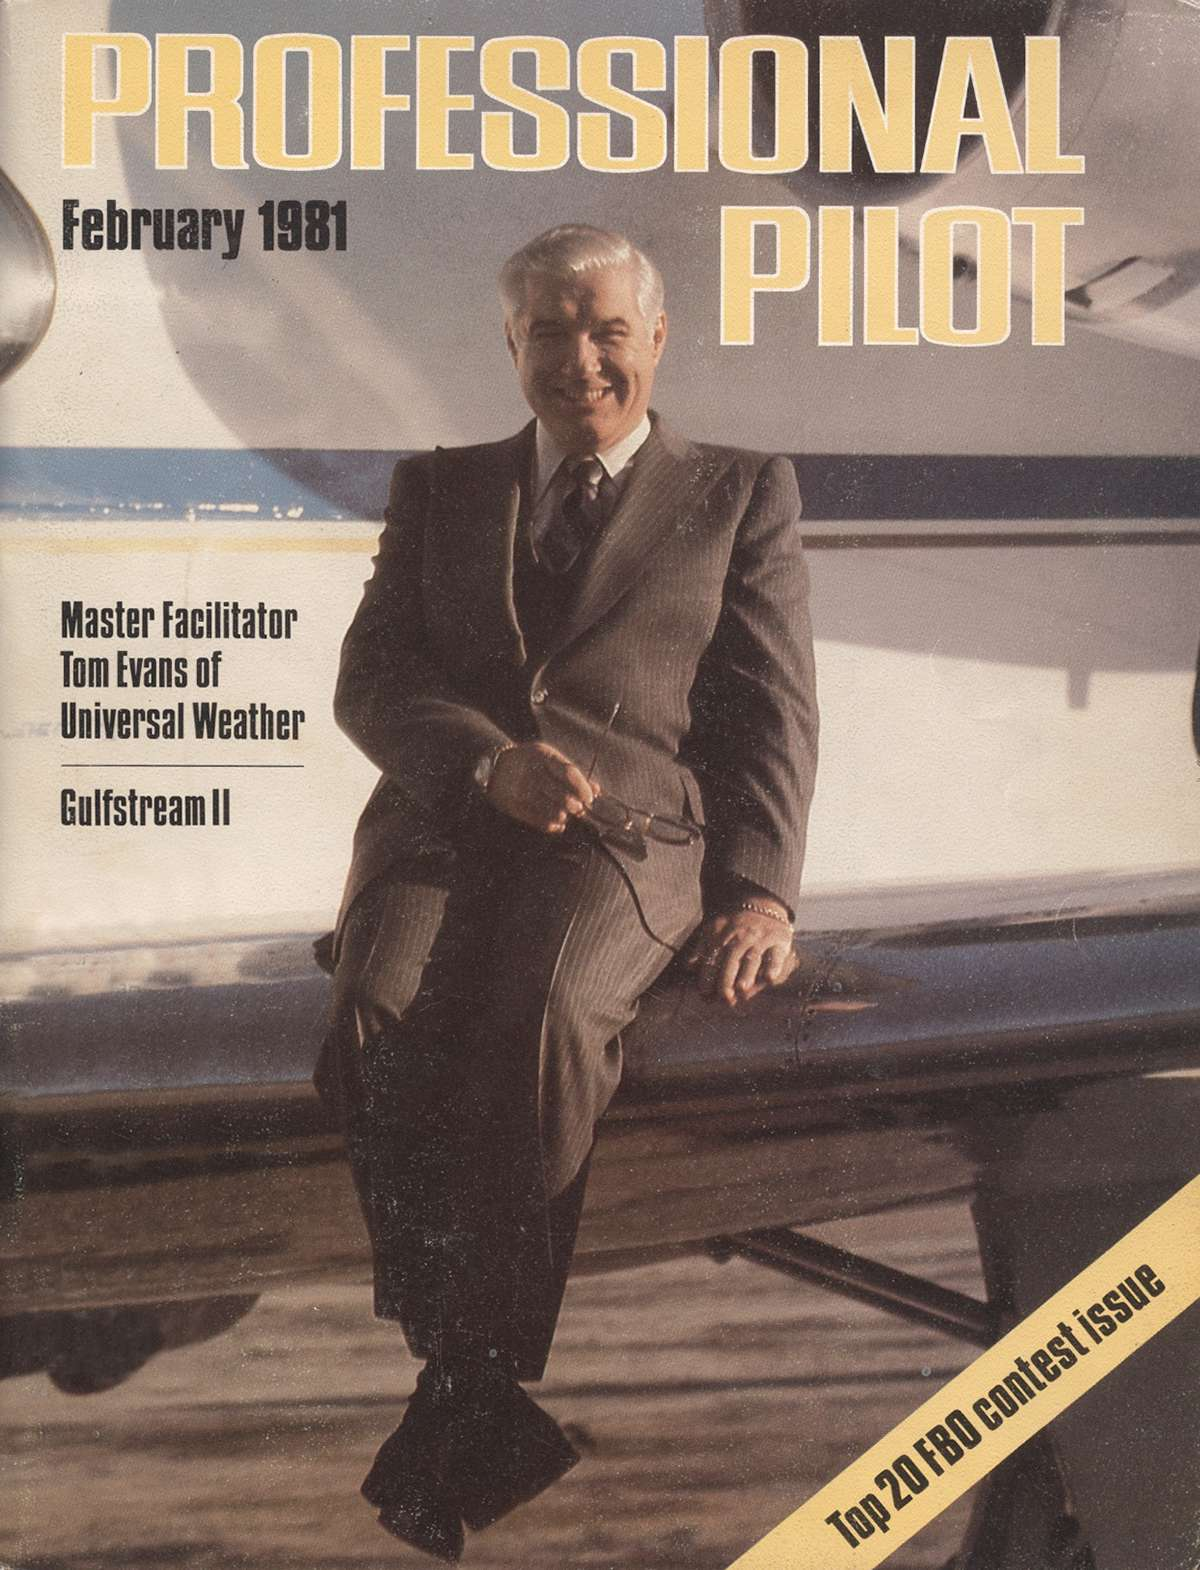 history-tom-evans-professional-pilot-cover-feb-1981